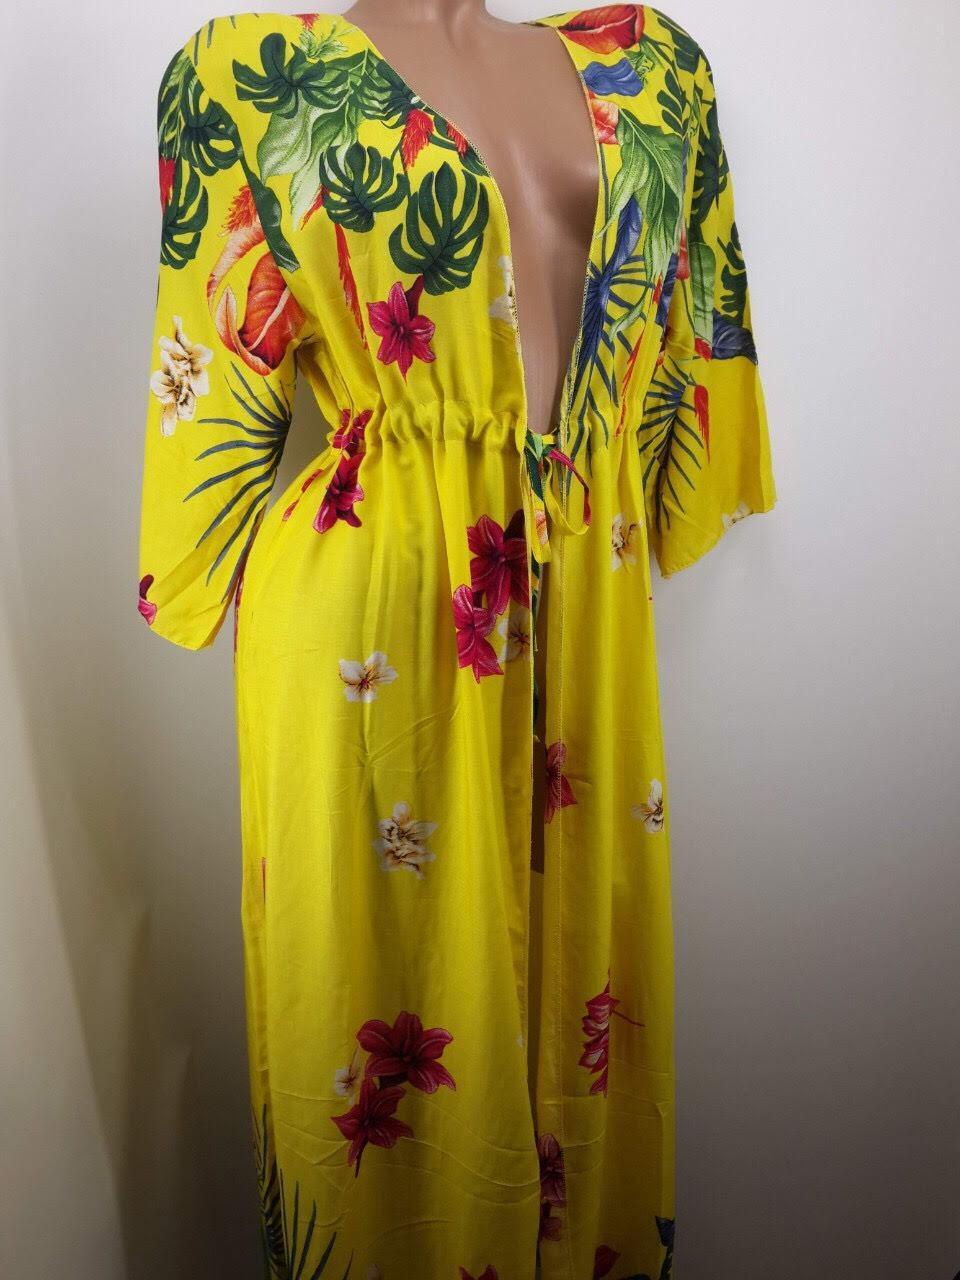 Халат пляжный желтый Цветы на наши 48-54 размеры.